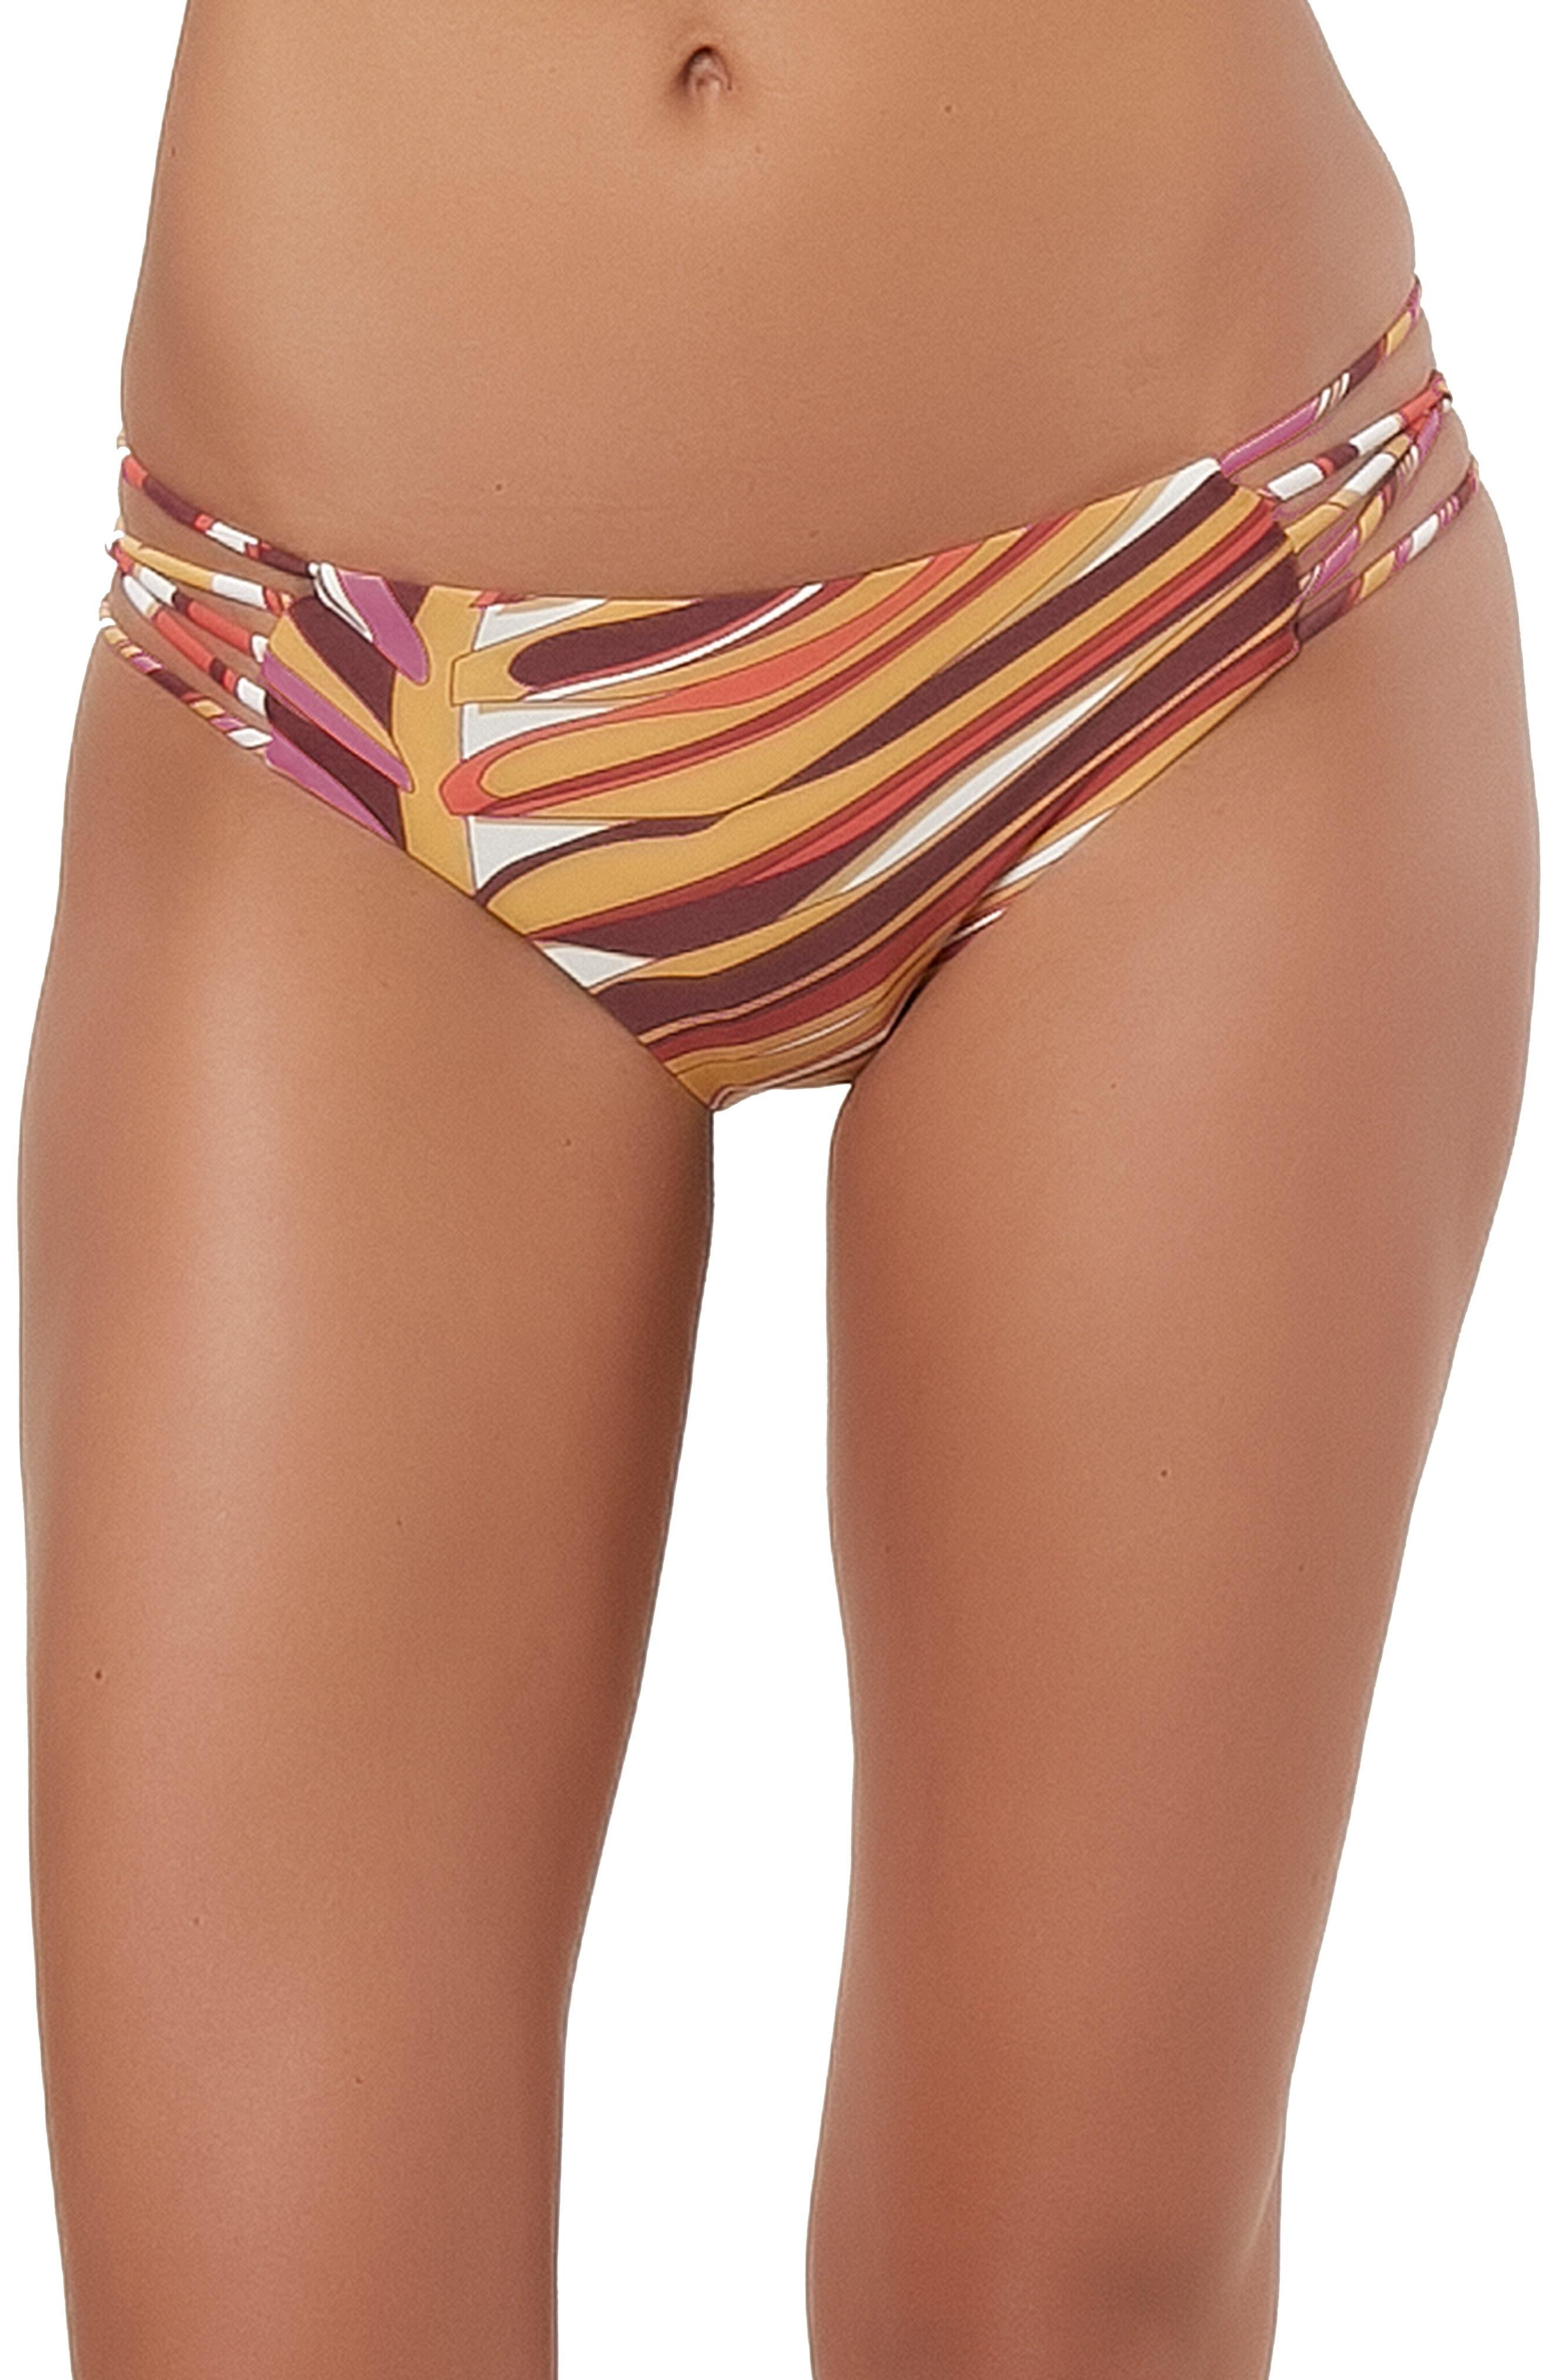 Anacapa Strappy Hipster Bikini Bottoms,                         Main,                         color, PURPLE MAUVE